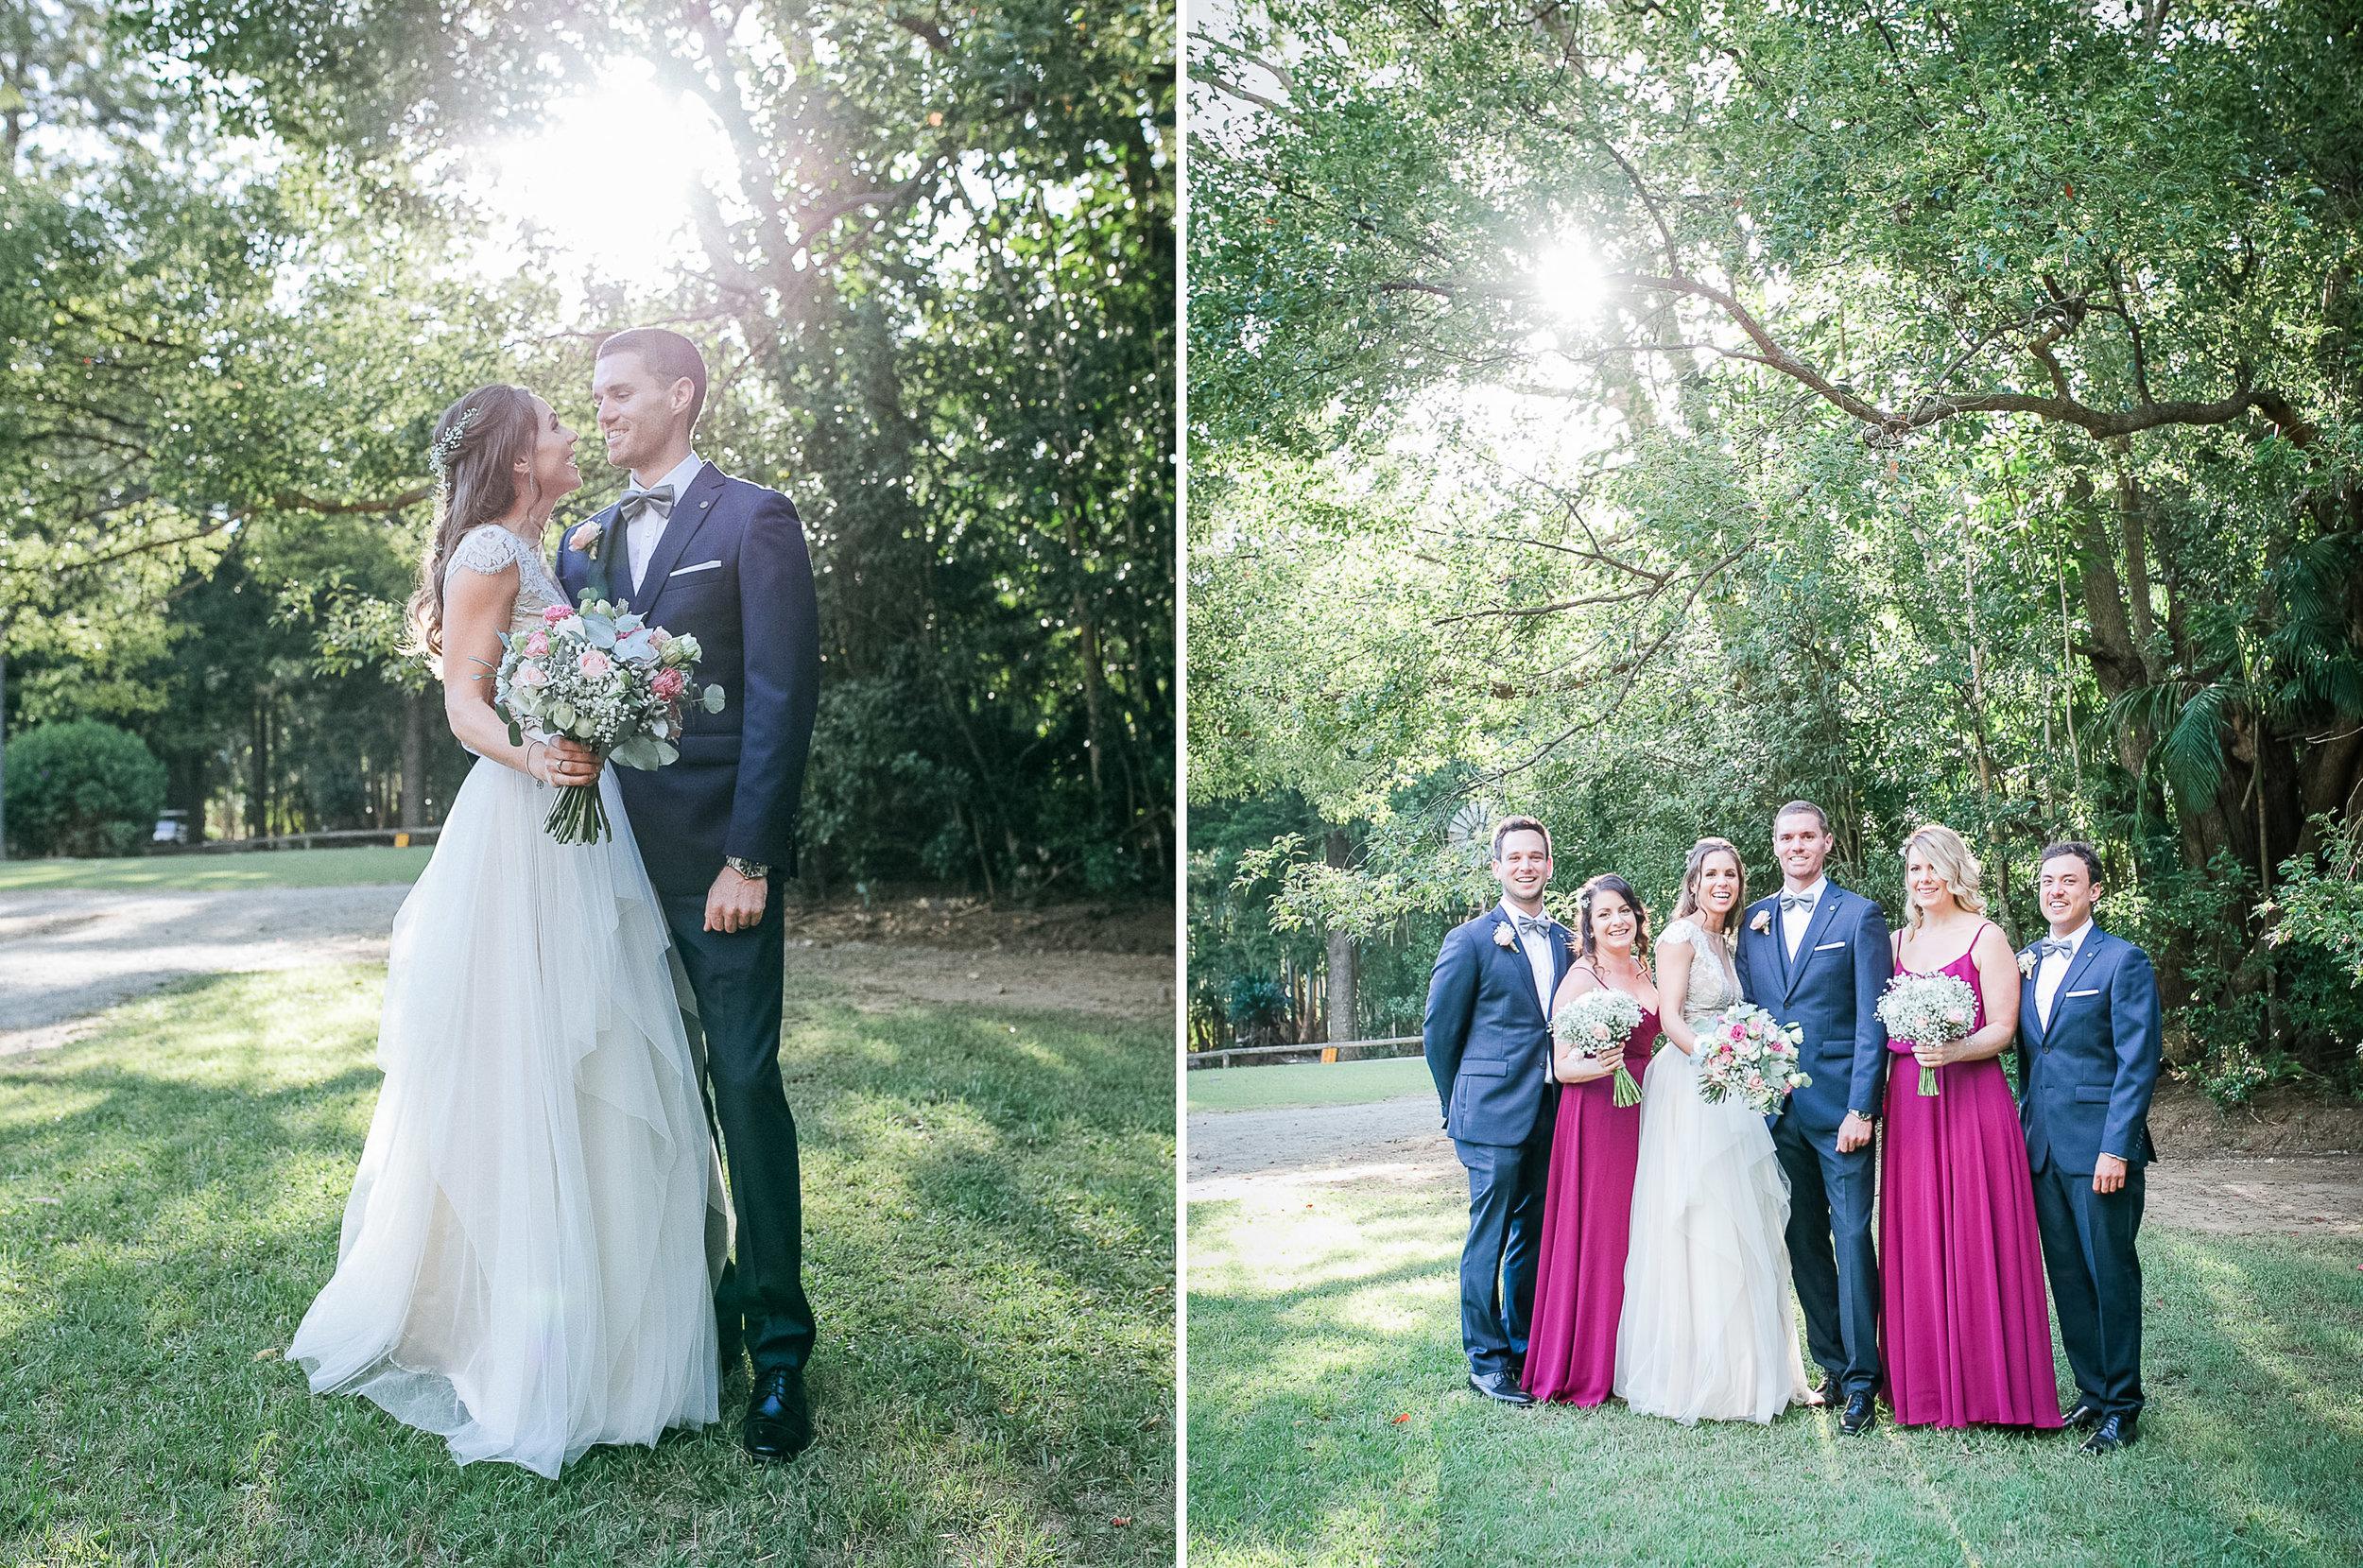 True North Photography_Boomerang Farm_Amy and Michael_Getting ready_Wedding Dress_Gold Coast Wedding_Bridal Party.jpg